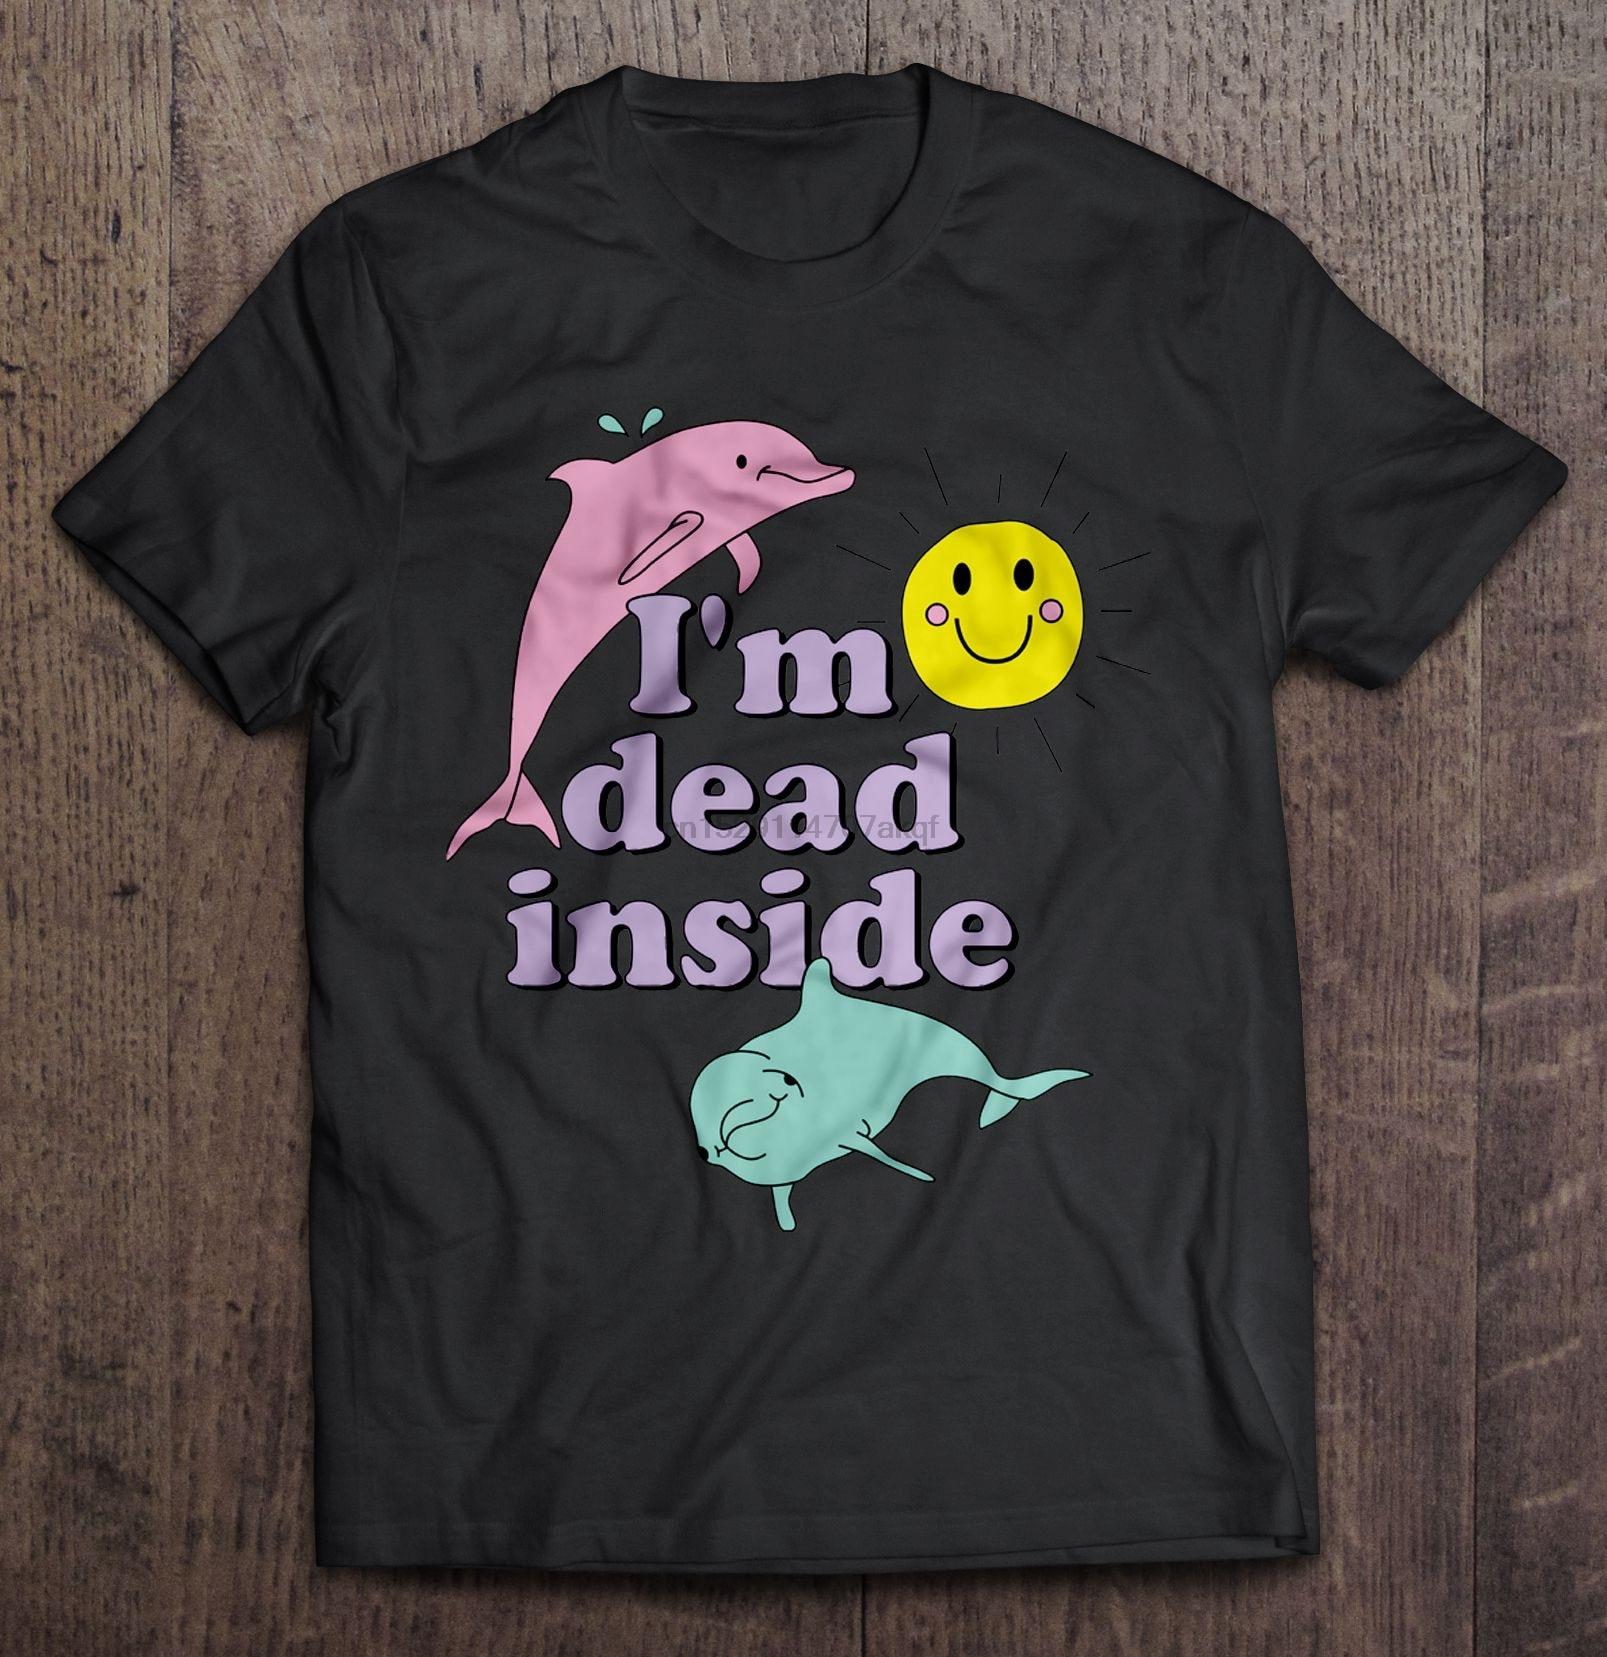 Мужская забавная футболка модная футболка I'm Dead Inside Dolphin версия женская футболка